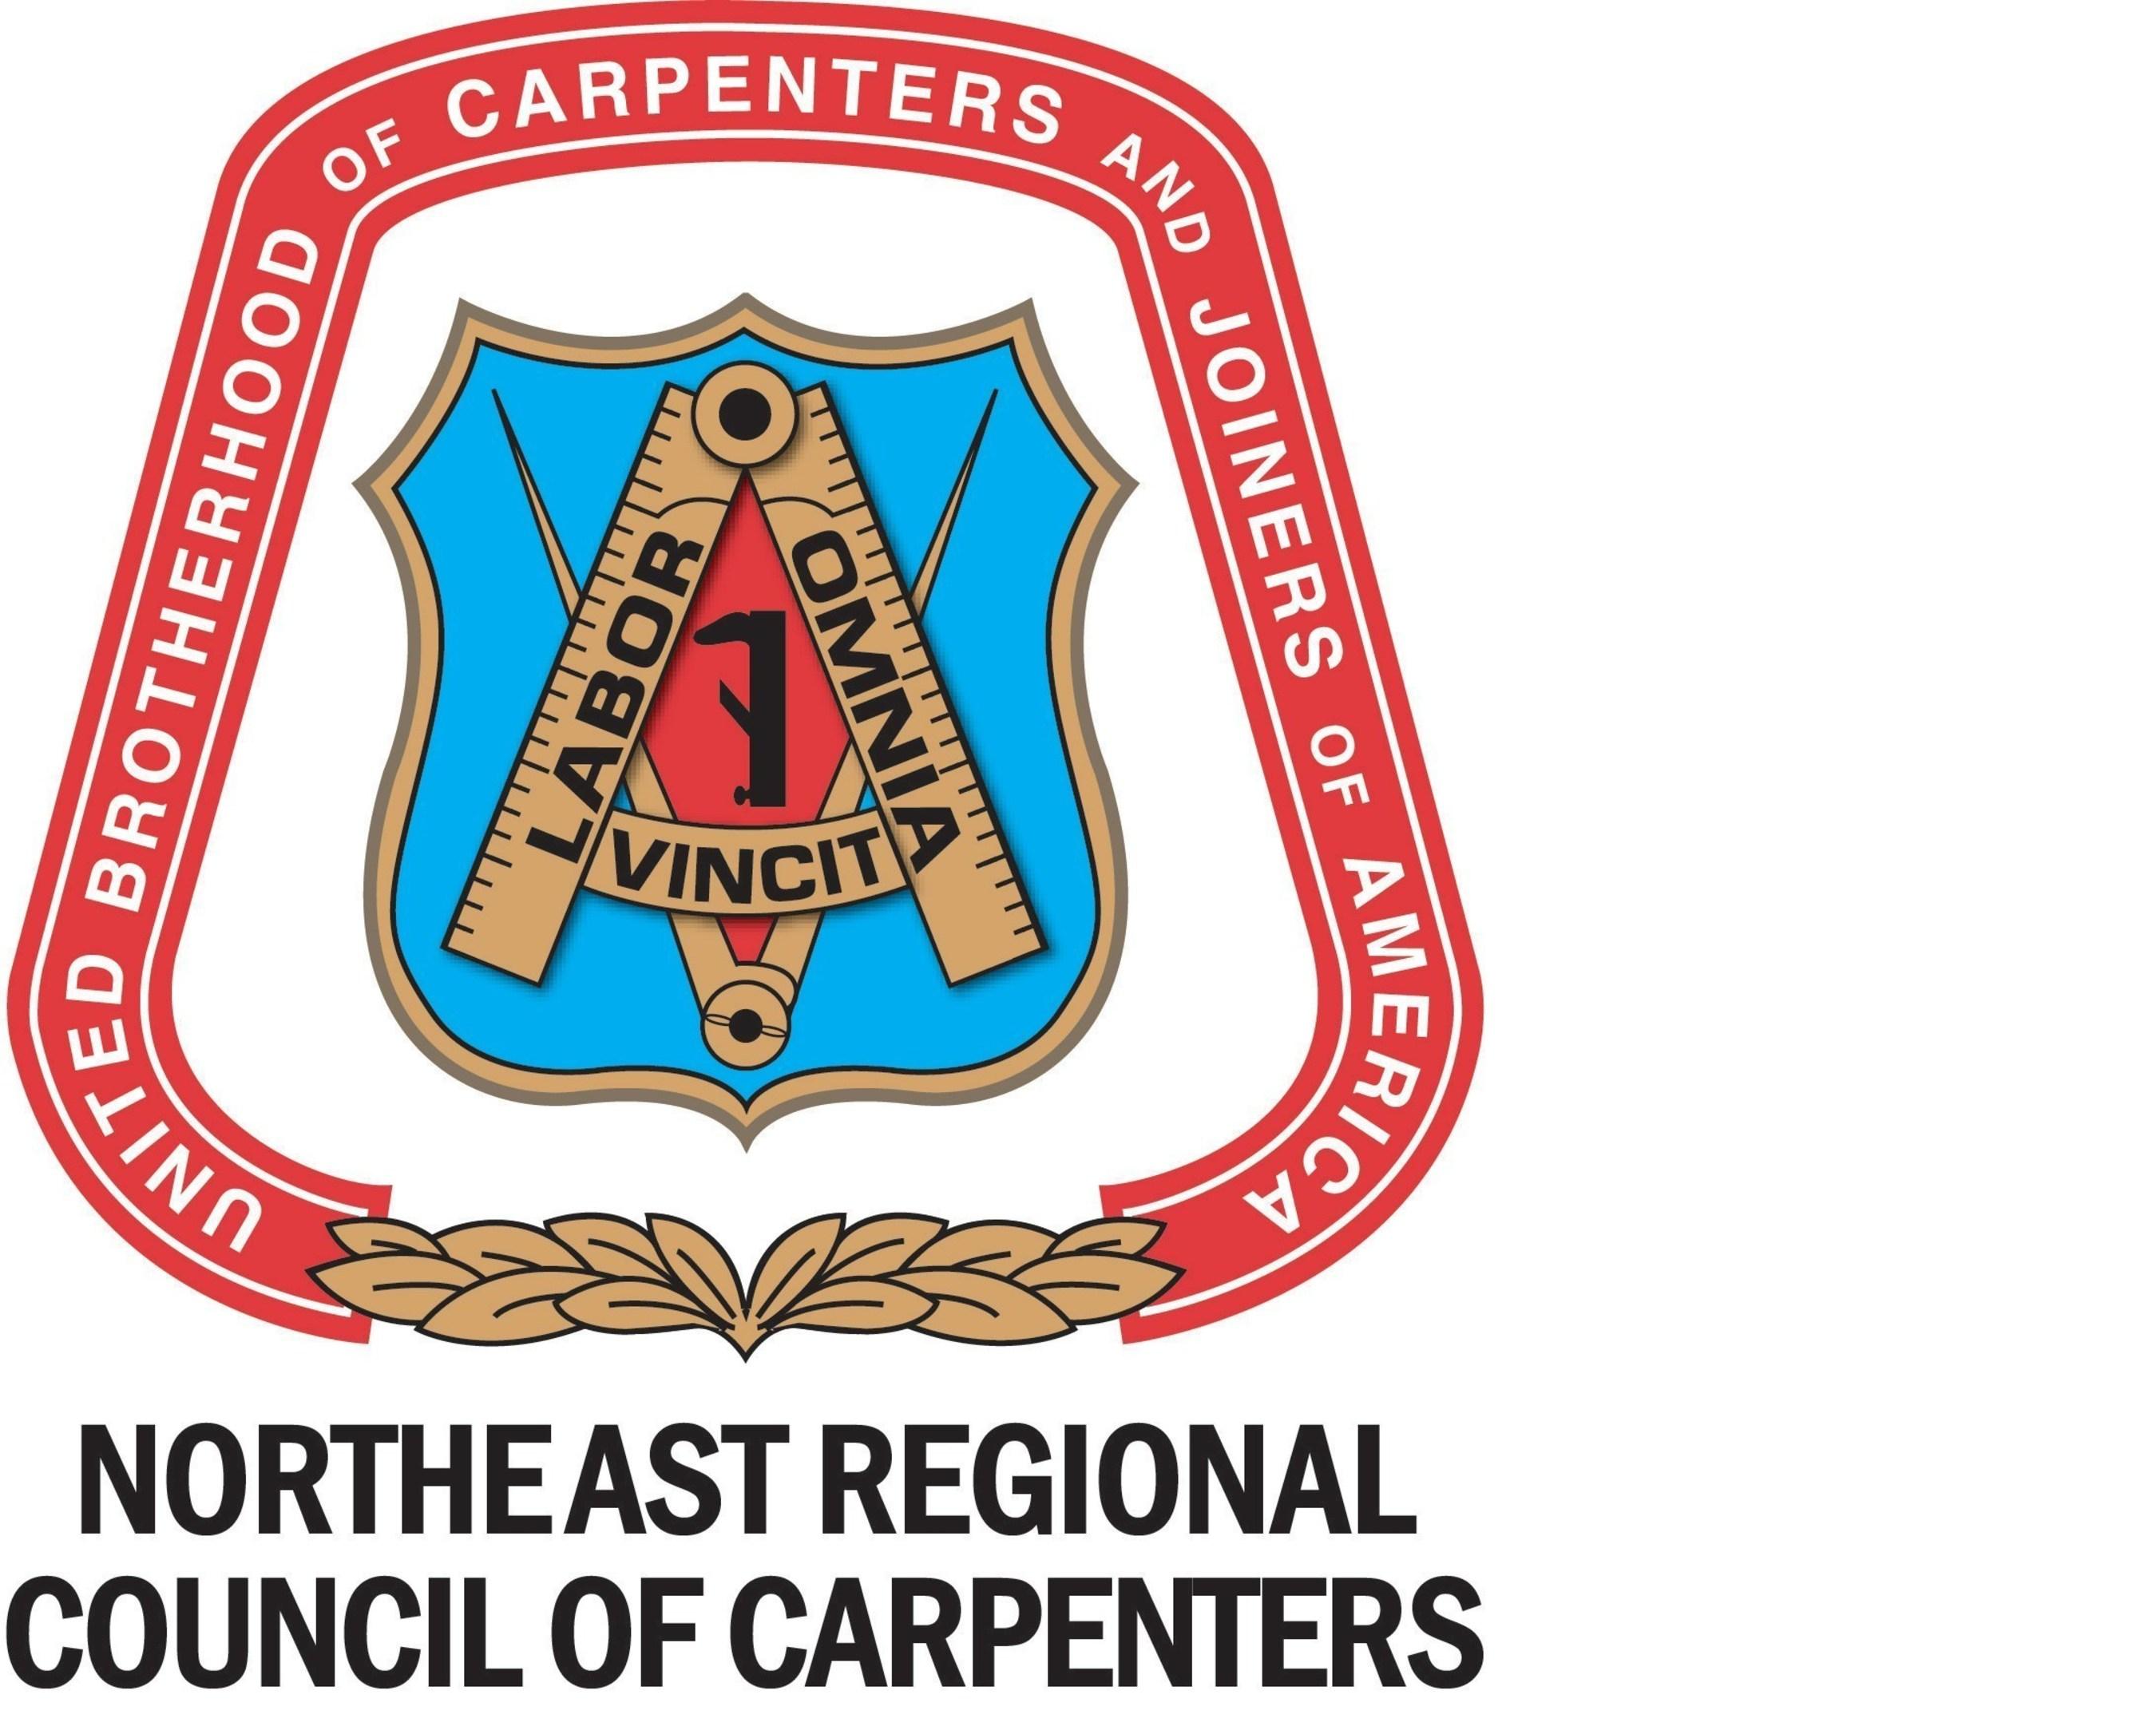 Northeast Regional Council of Carpenters (PRNewsFoto/Northeast Regional Council of C)